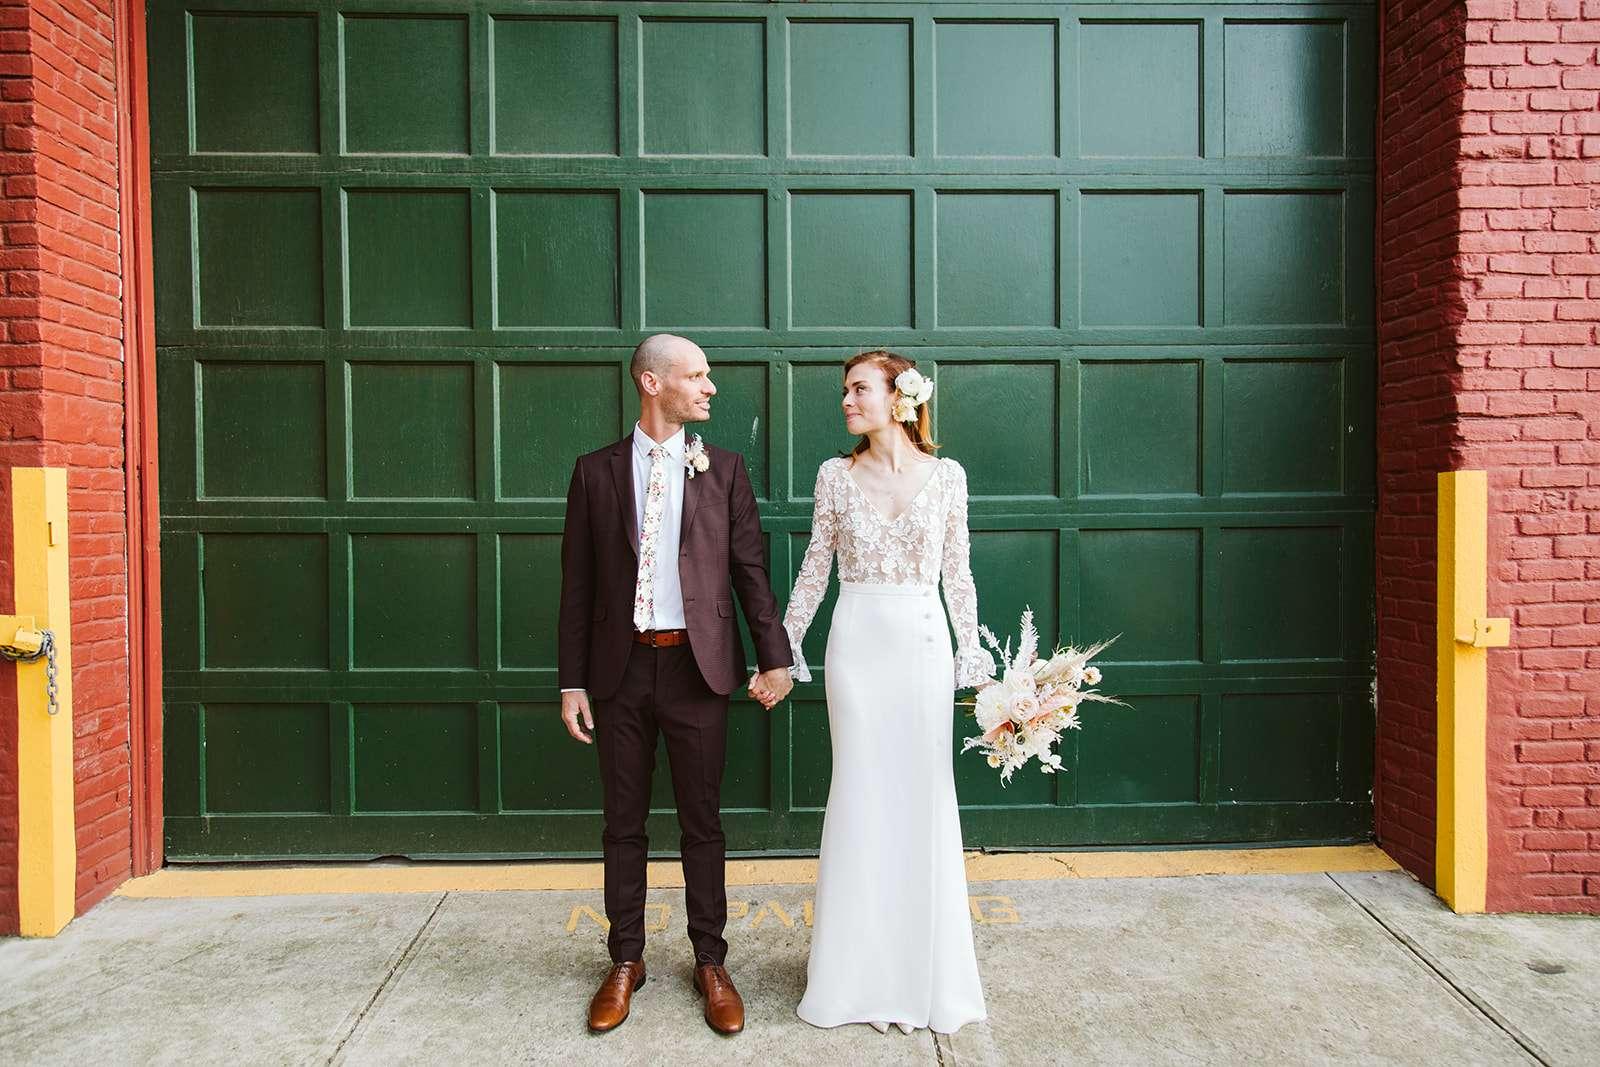 Williamsburg Wedding at Grand Ferry Park and Aurora Brooklyn - Natura Collective, New York City Wedding Photographer